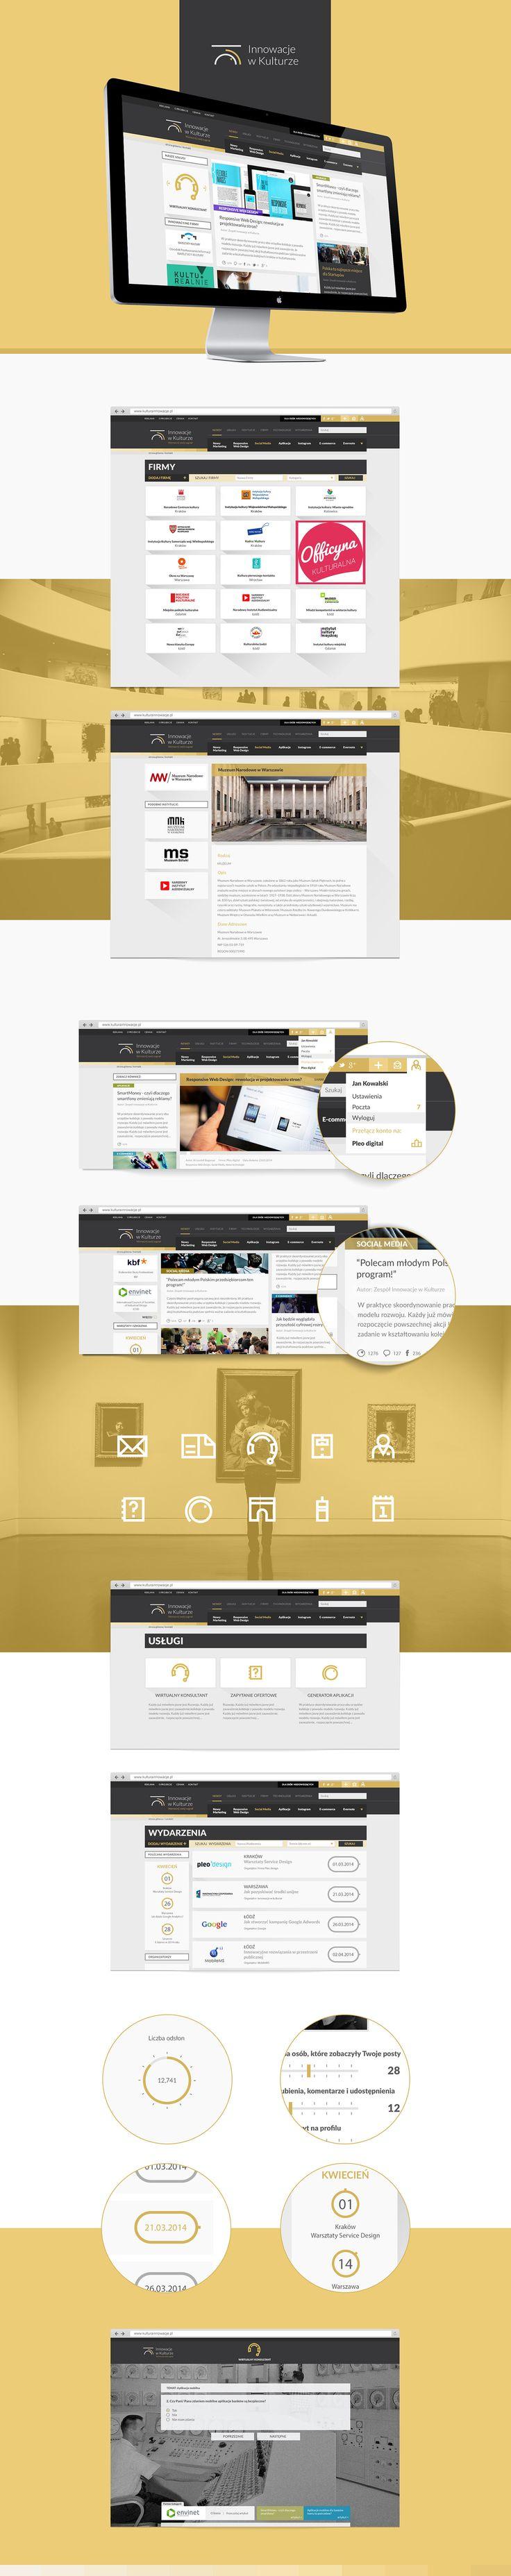 Innovations in Culture #design #UI #website #web #webdesign #pleo